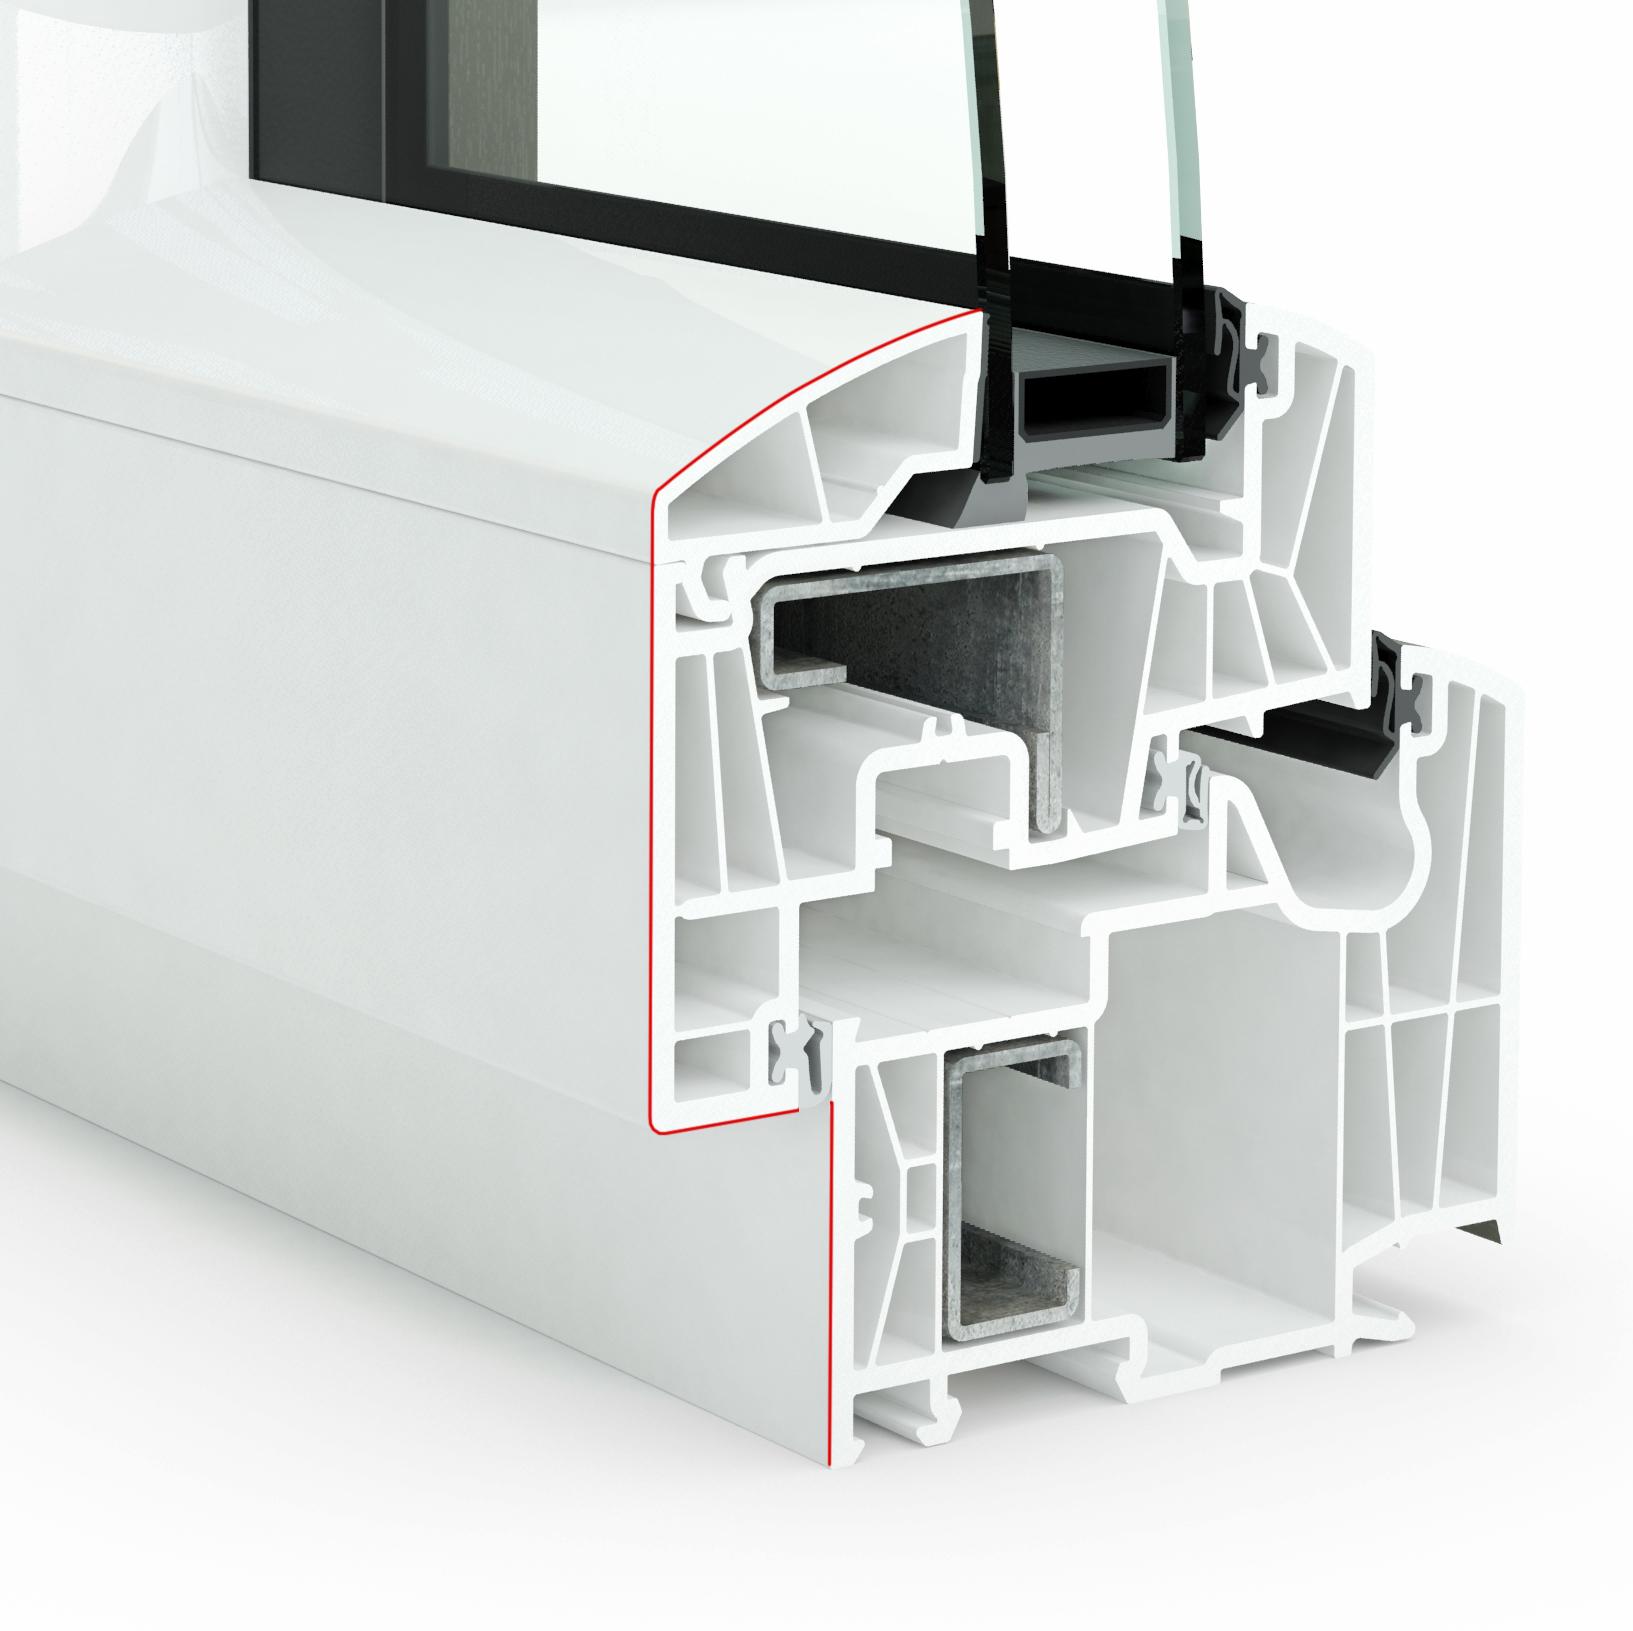 Design Pvc int double vitrage